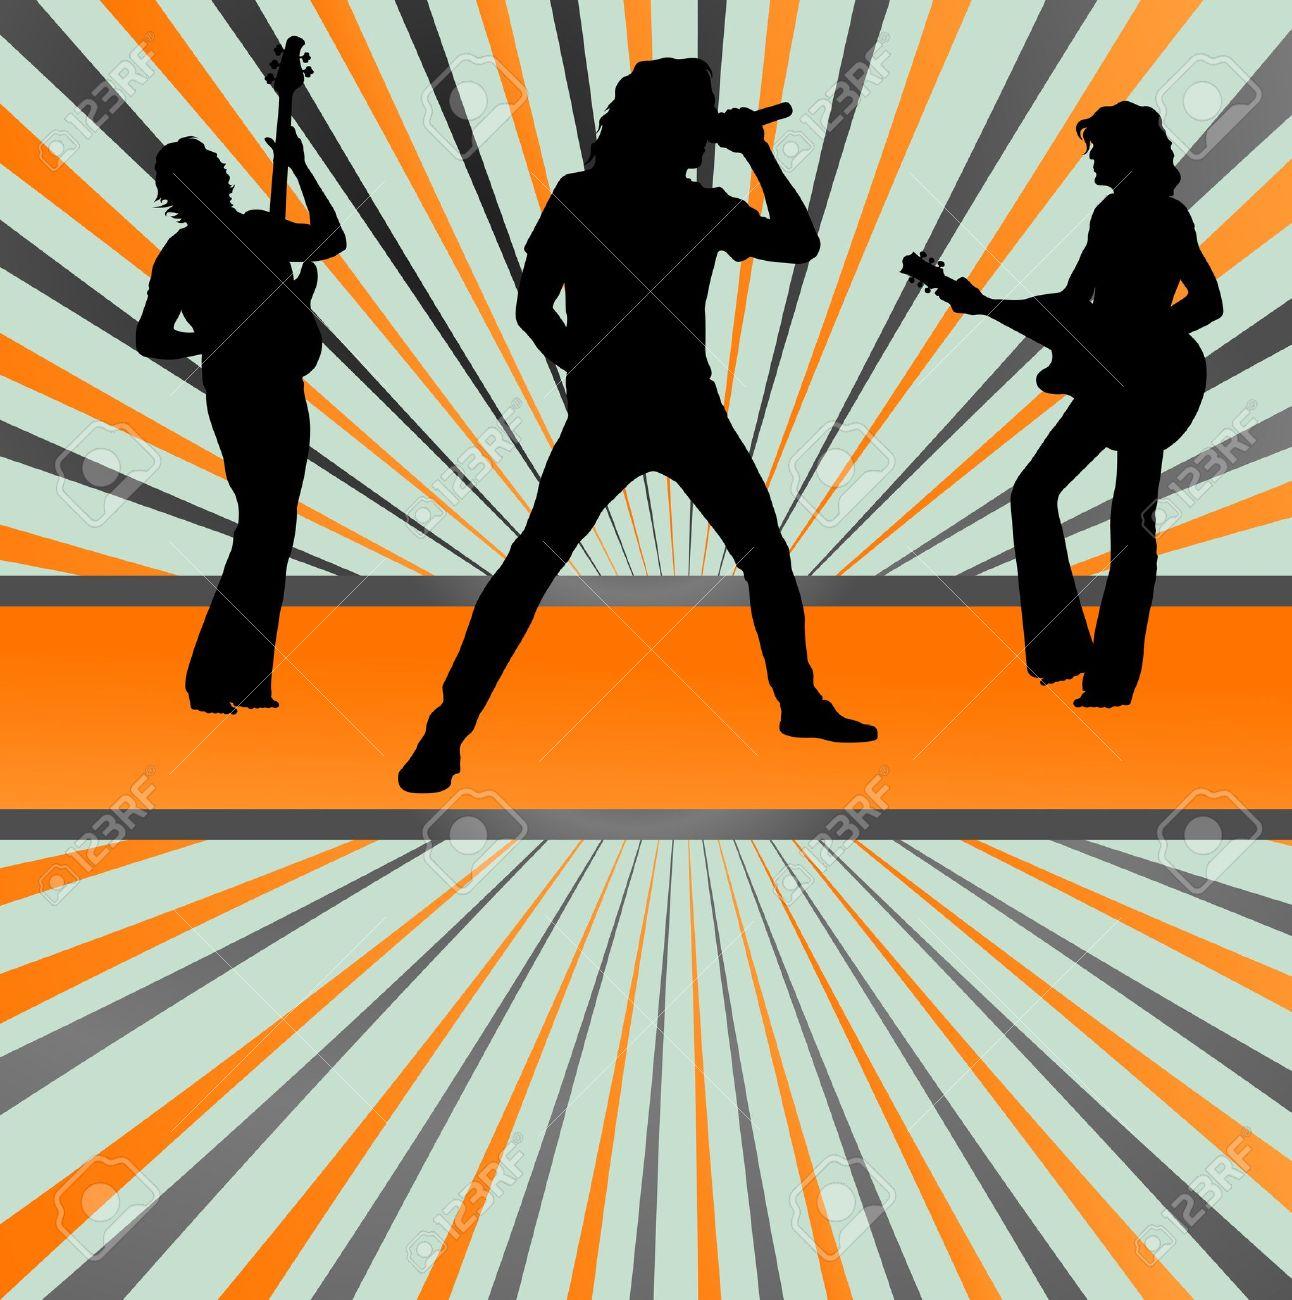 Pics photos rock concert background - Rock Concert Band Burst Background Vector For Poster Stock Vector 14355894